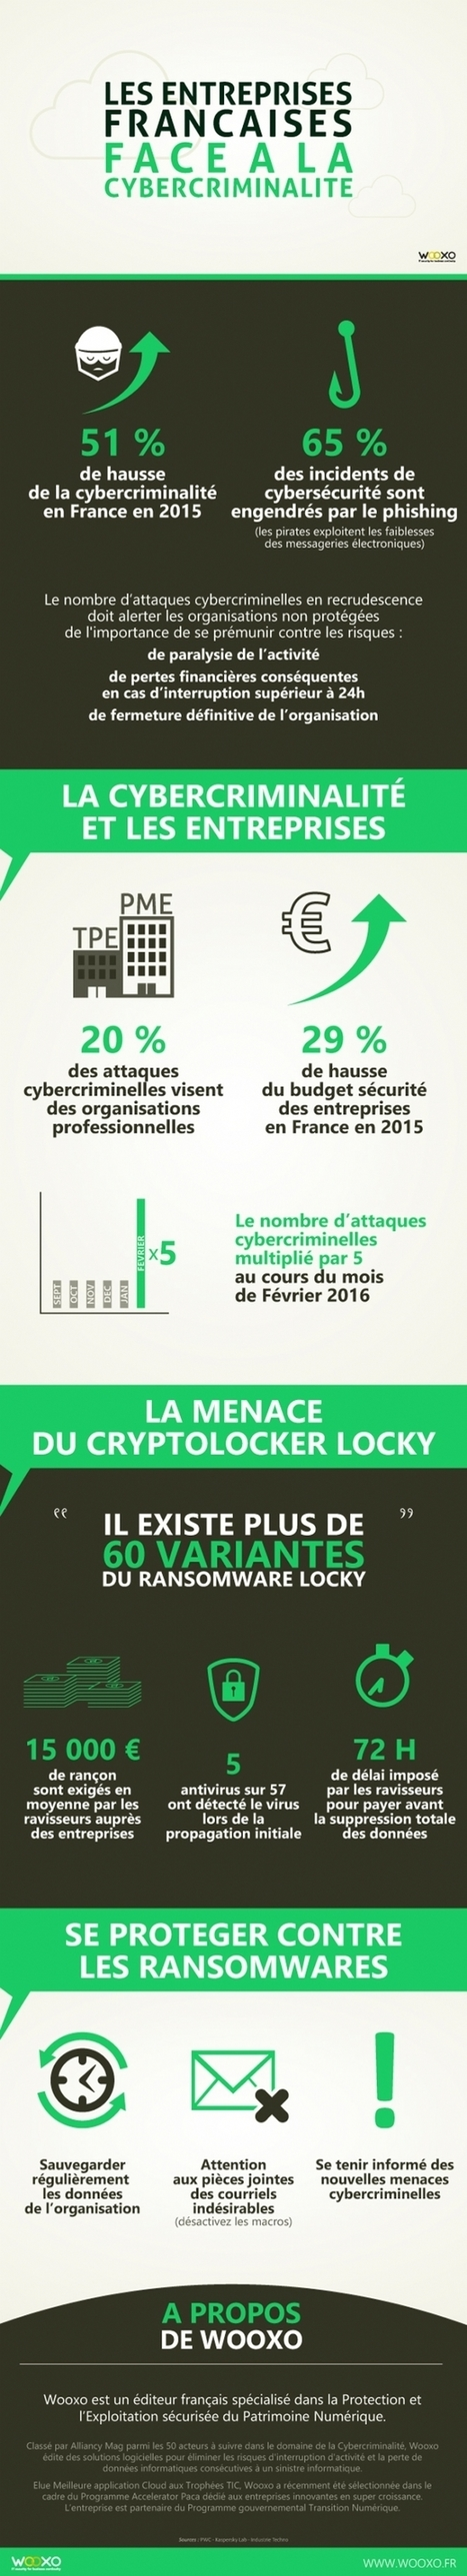 Cybercriminalite augmente en France   scoop.it   Scoop.it